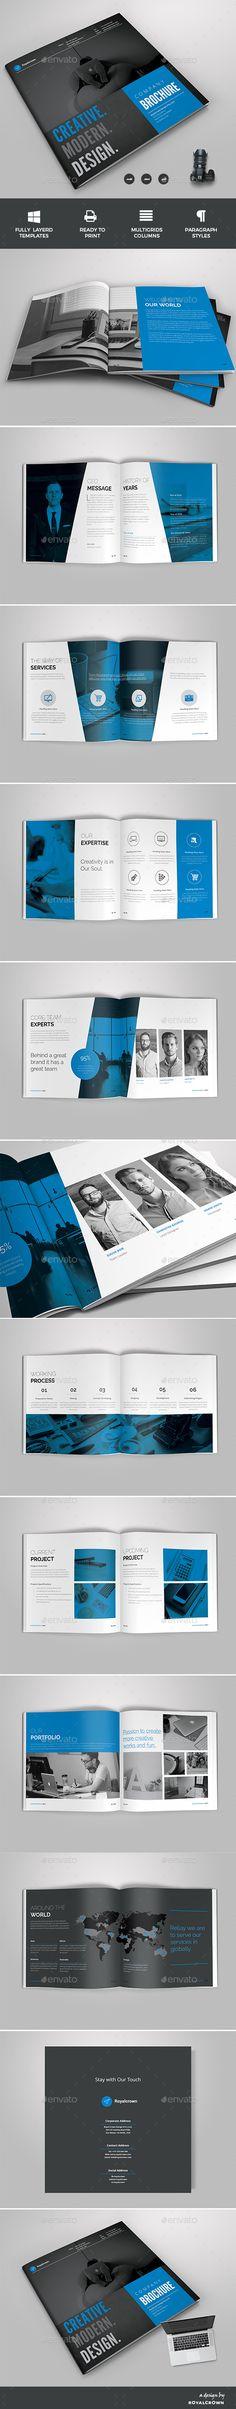 Brochure Template InDesign INDD. Download here: https://graphicriver.net/item/brochure/17410244?ref=ksioks